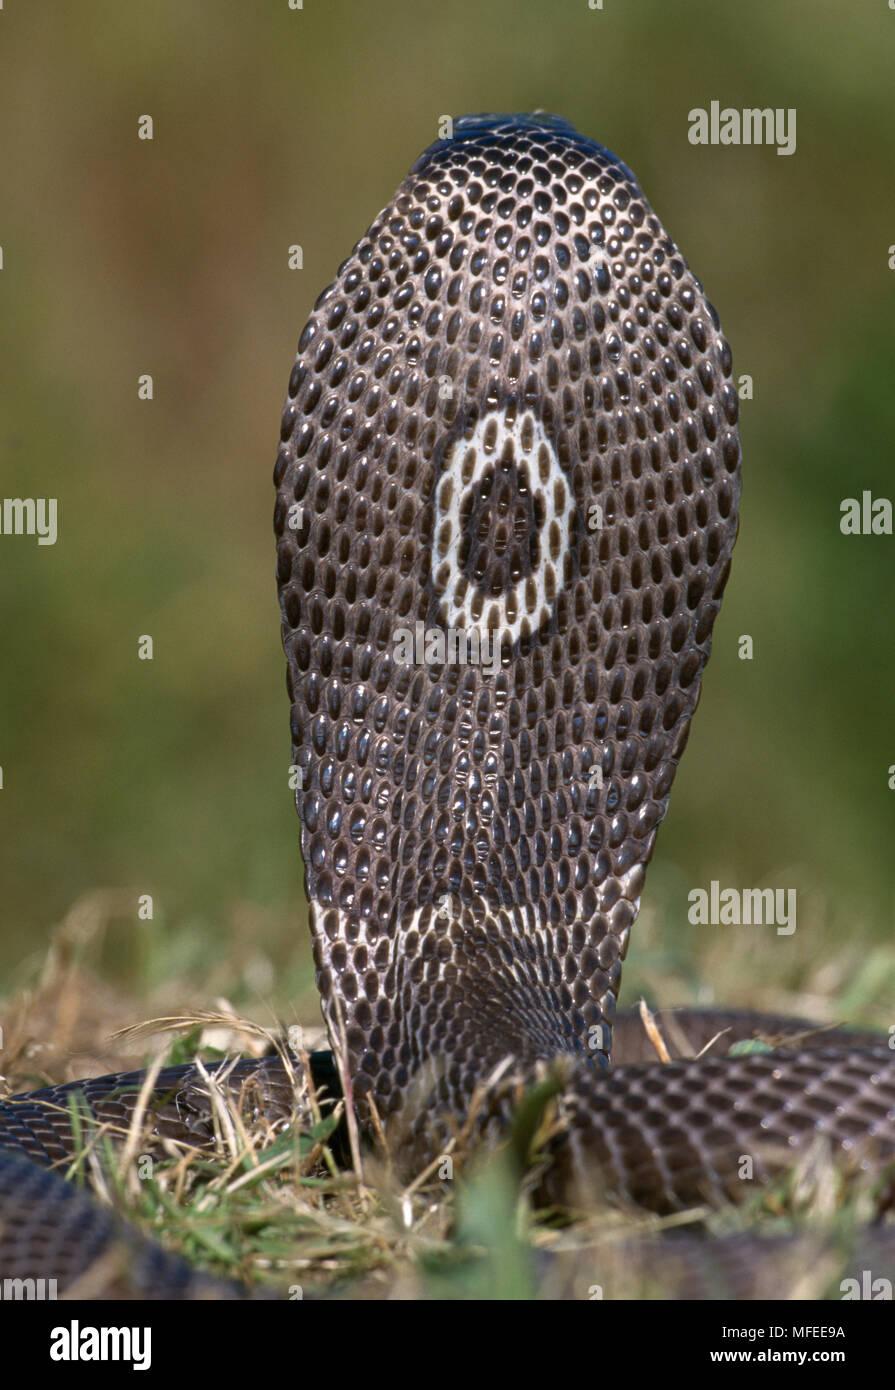 MONOCLED o SPECTACLED COBRA Naja naja kaouthia vista posteriore del cofano mostra monoclasse marcatura. Foto Stock